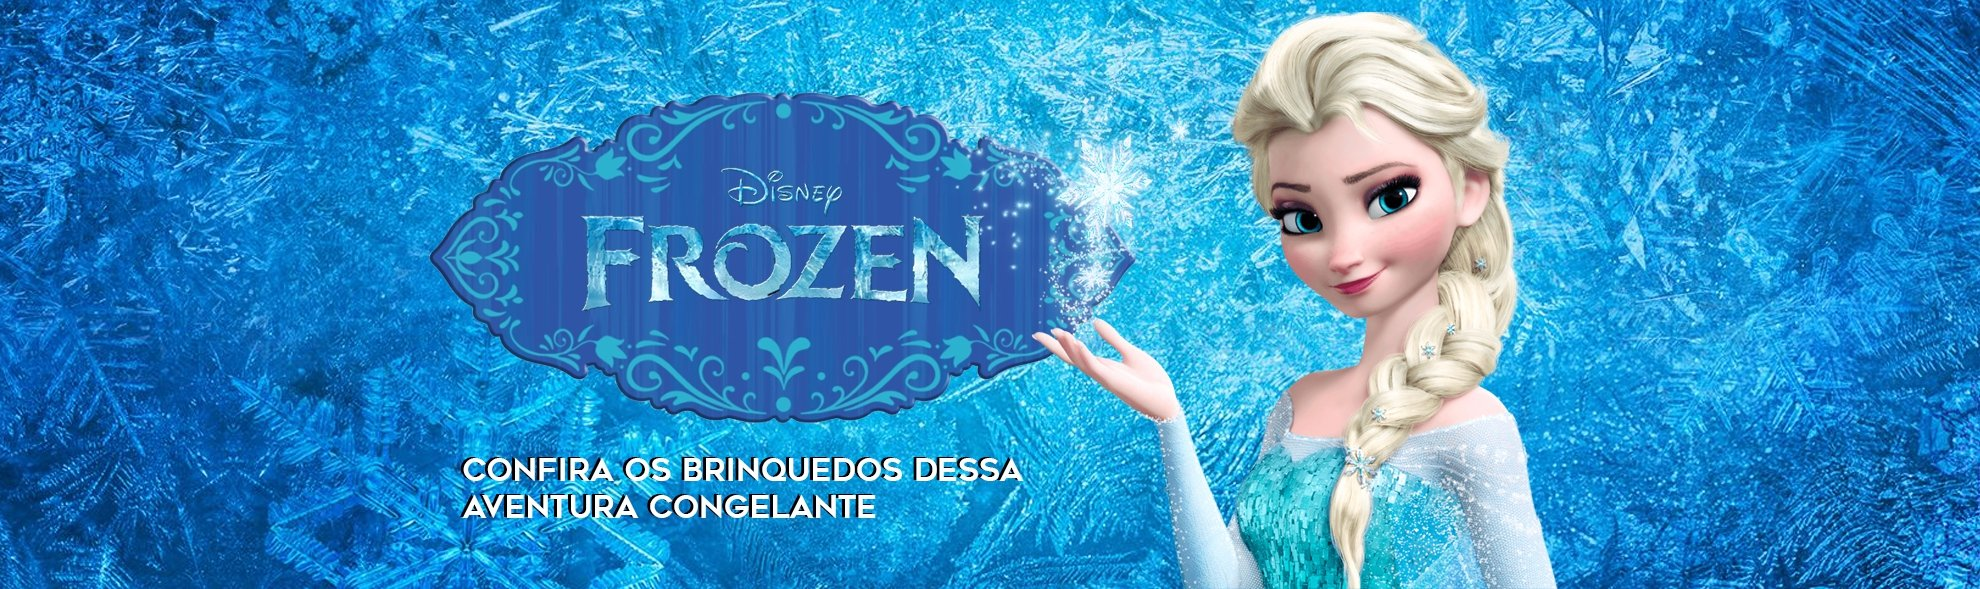 Princesas frozen